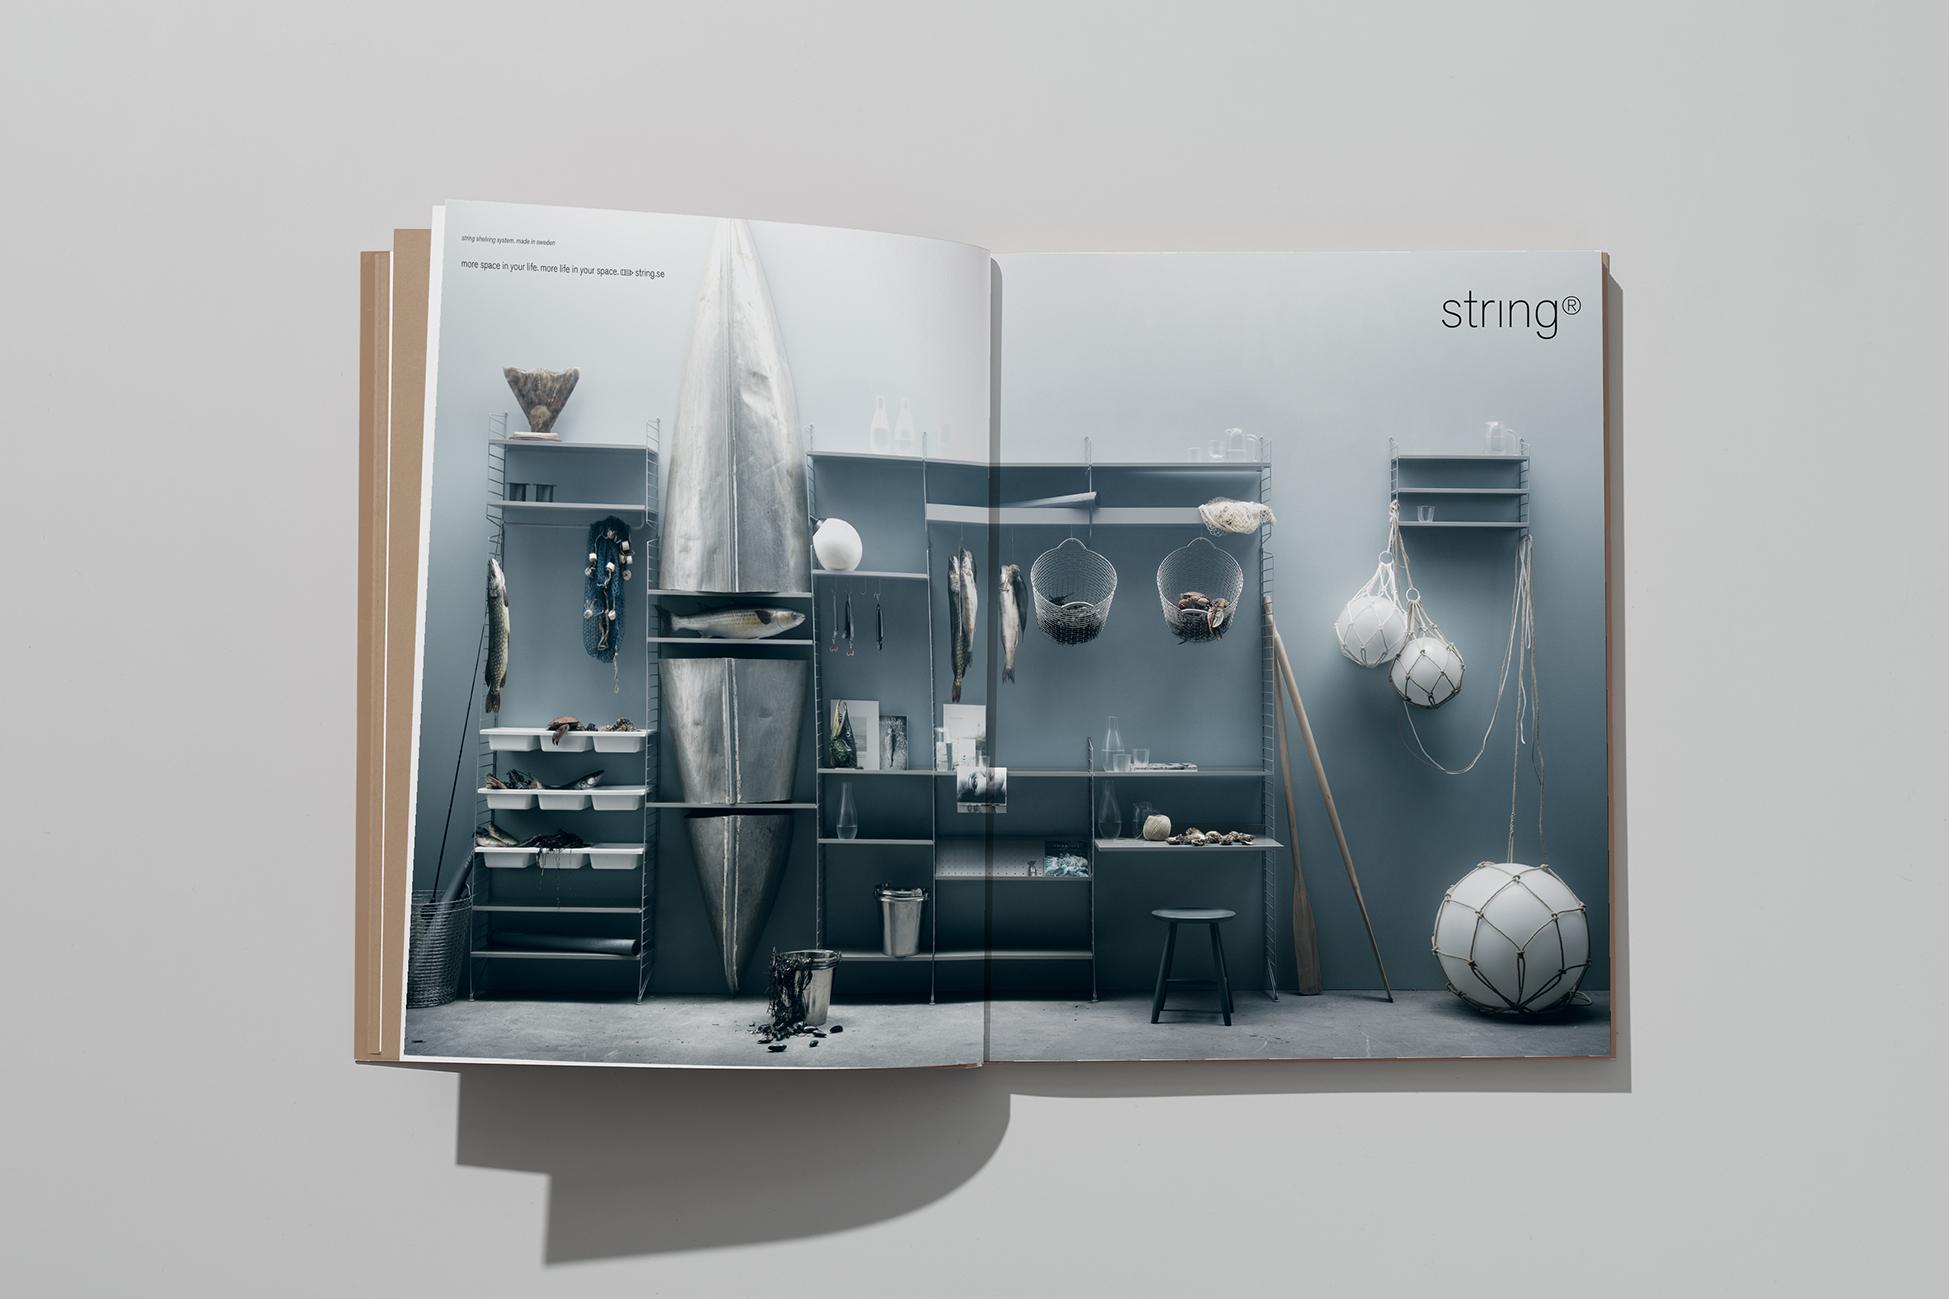 ÖPPET | String Ad 2018 Boat